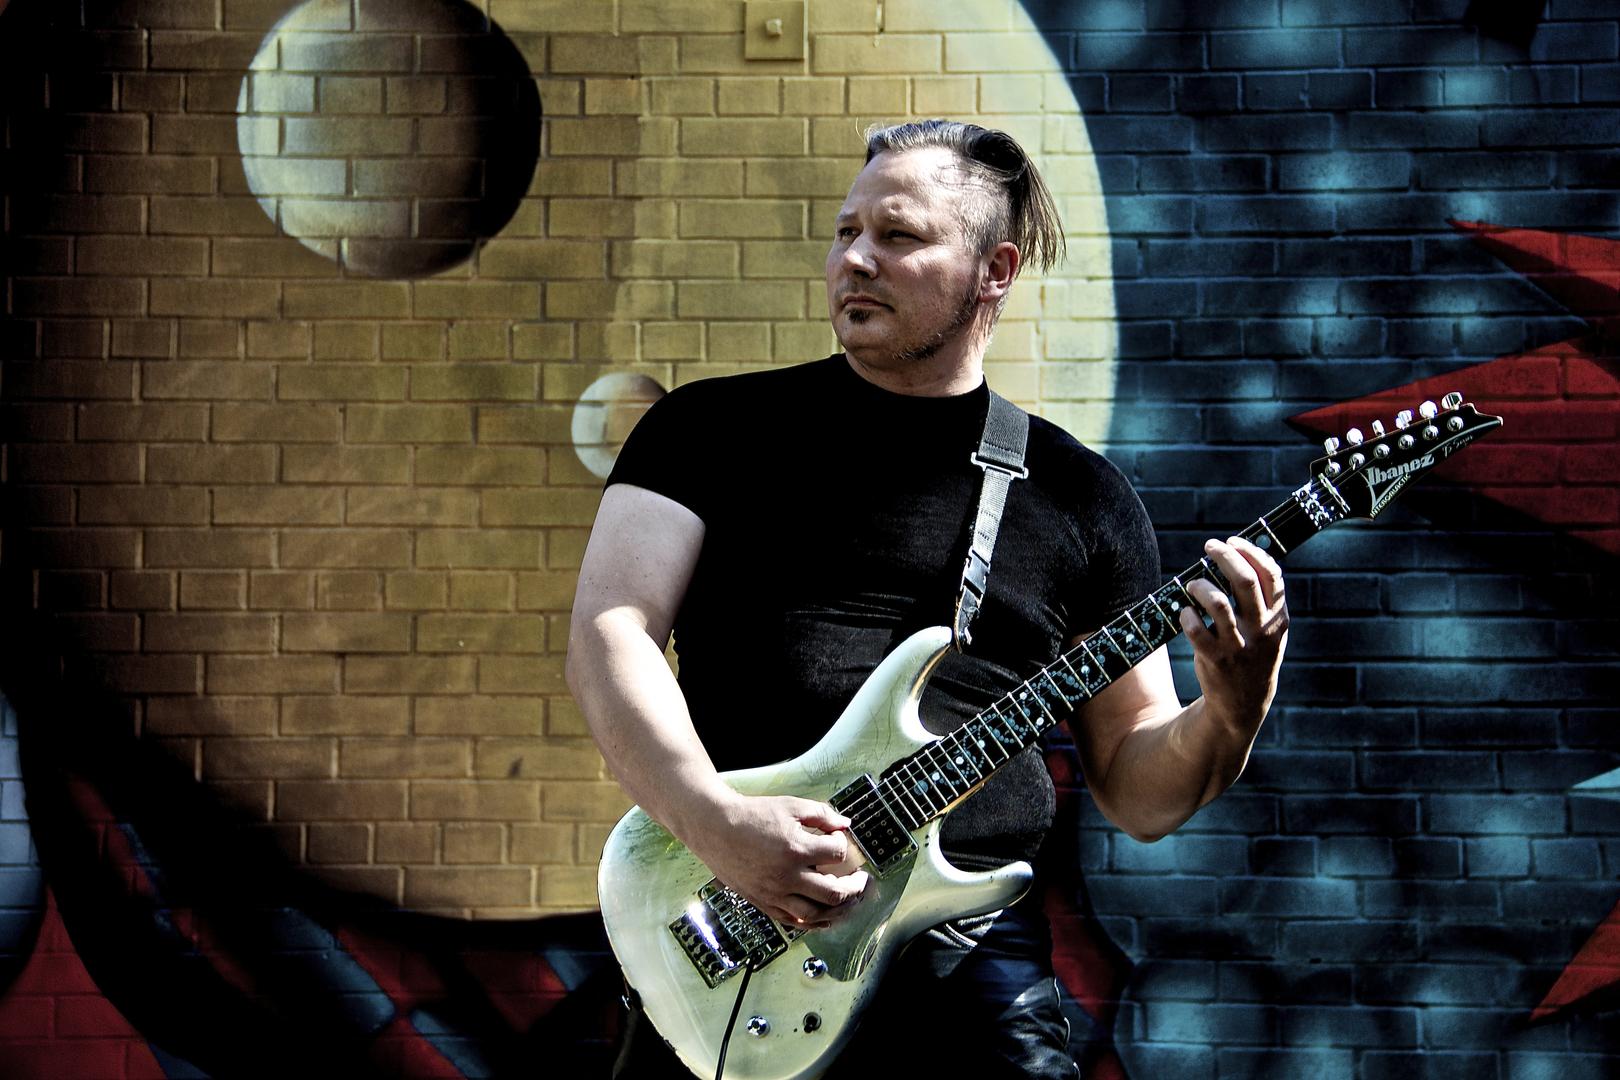 guitar lessons | Kevin Estrella, Pyramids On Mars™ | String Skipping Arpeggio Melody III